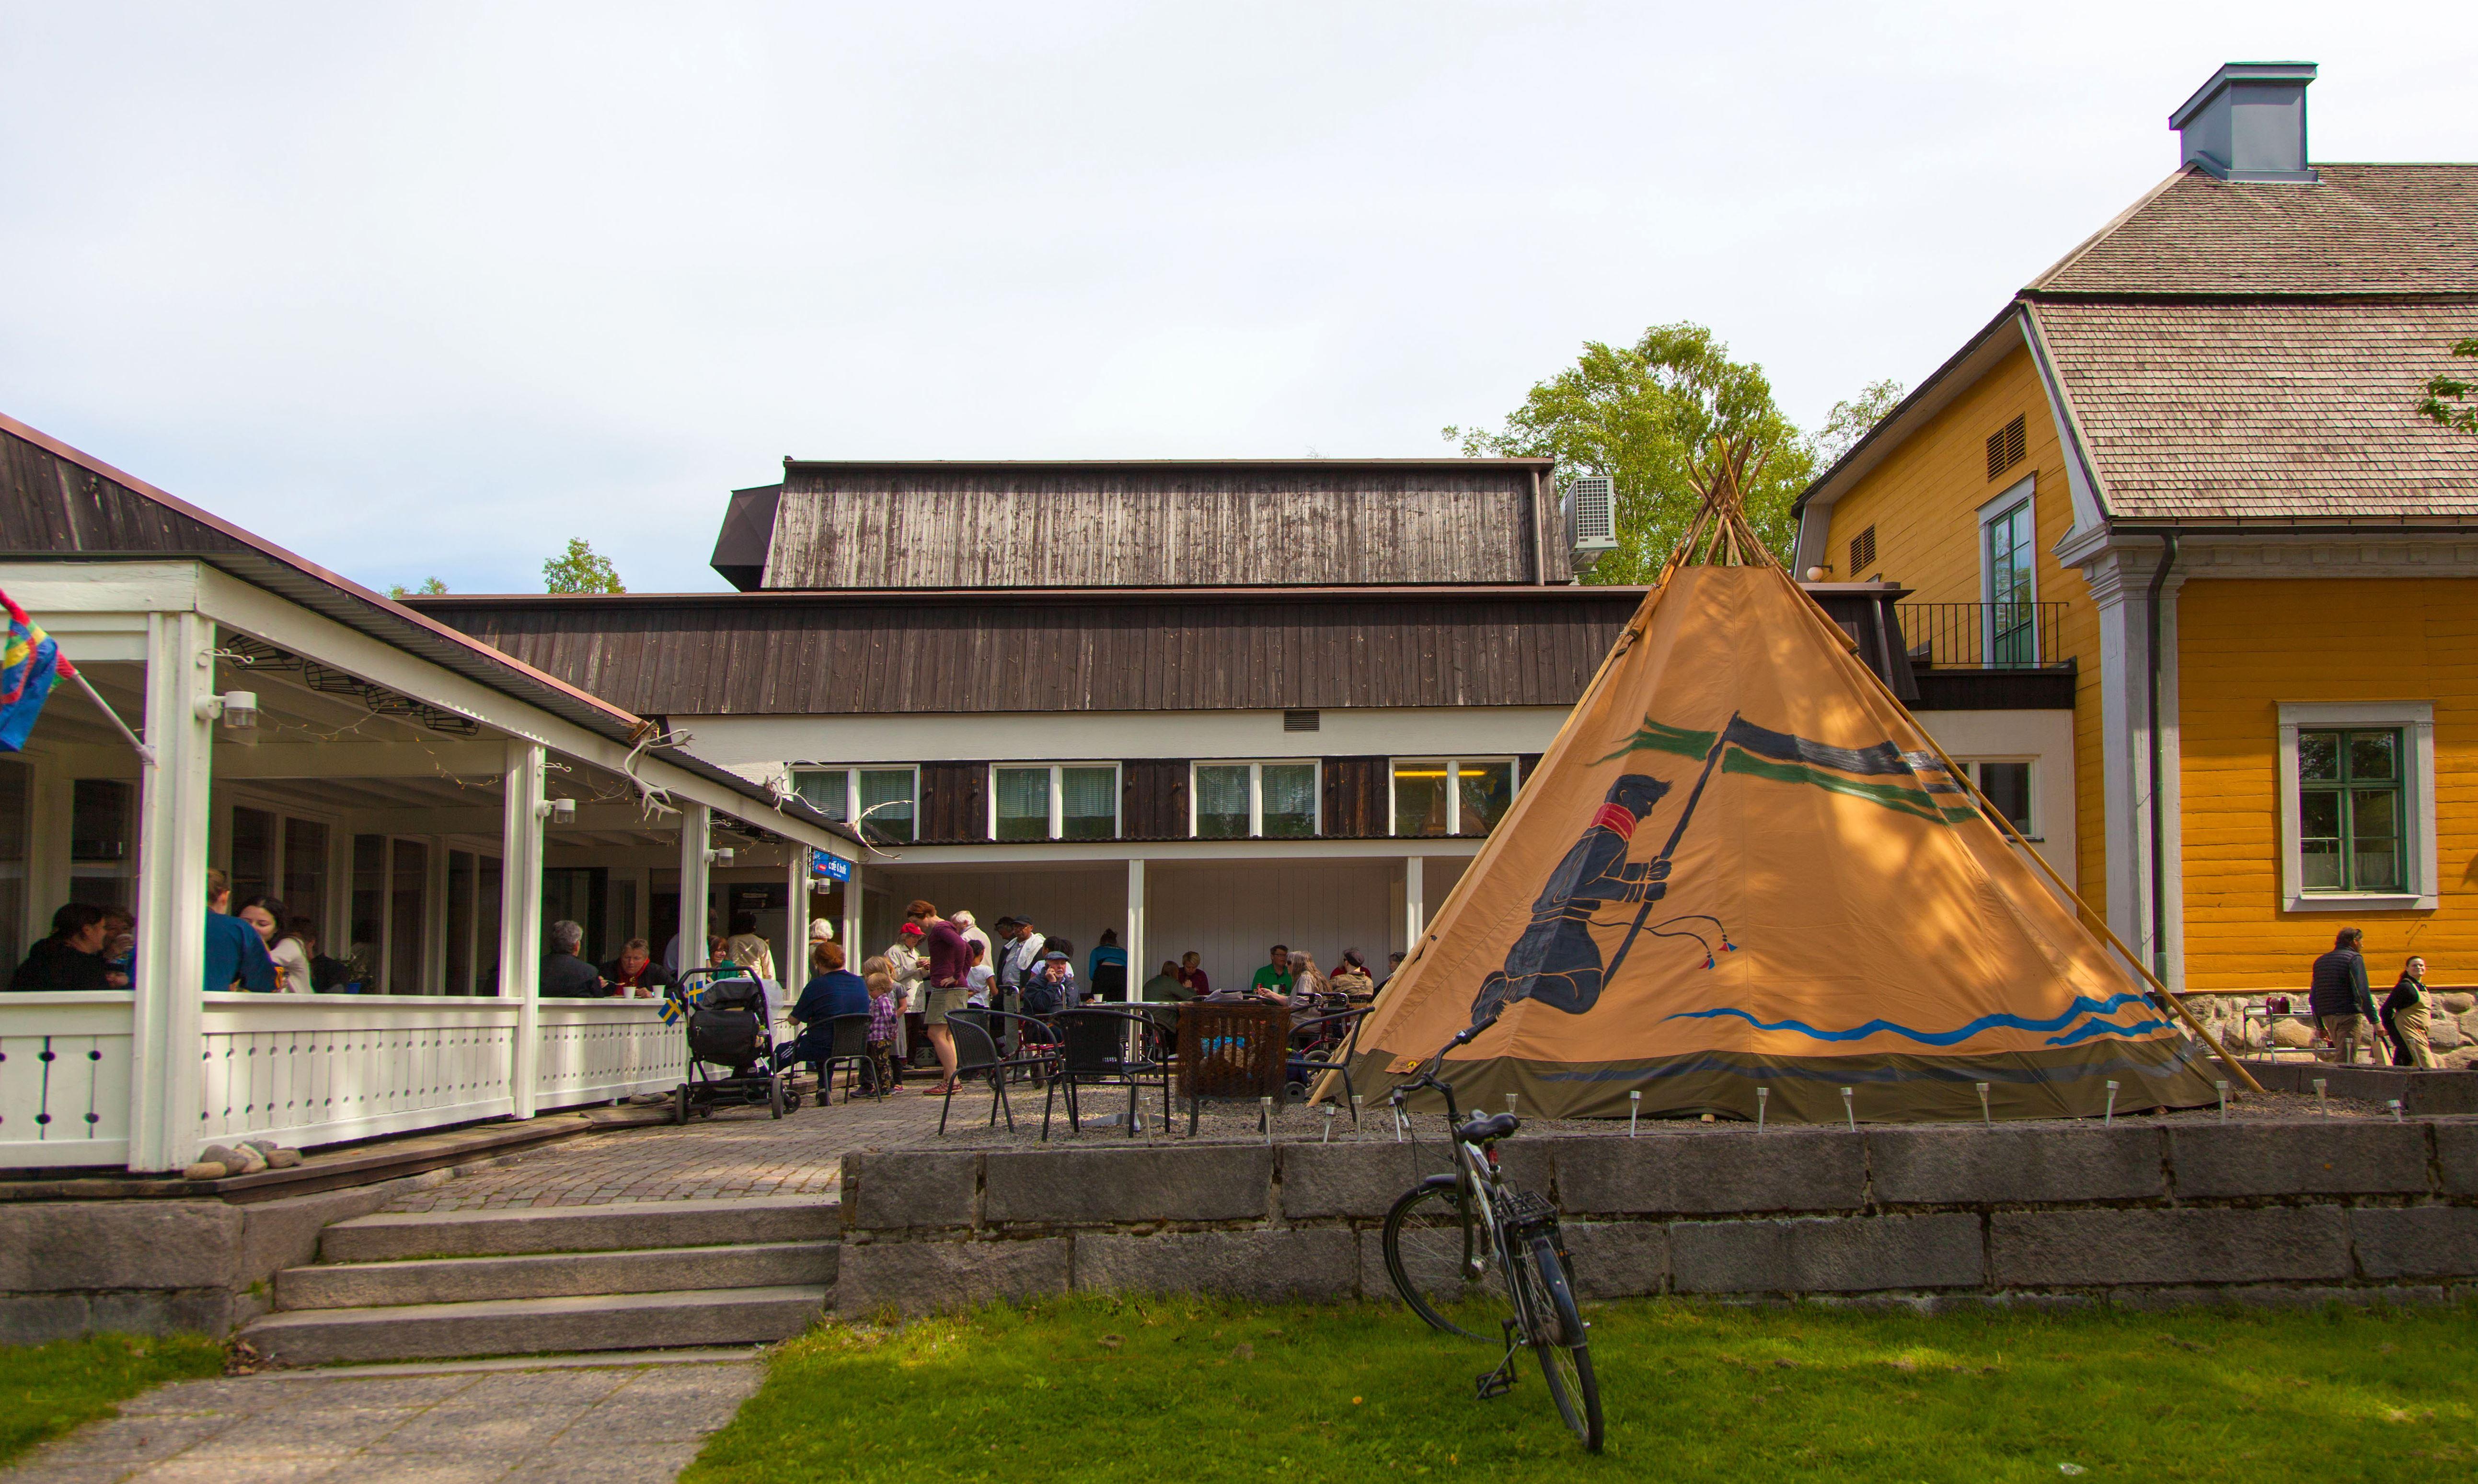 Samisches café Tráhppie